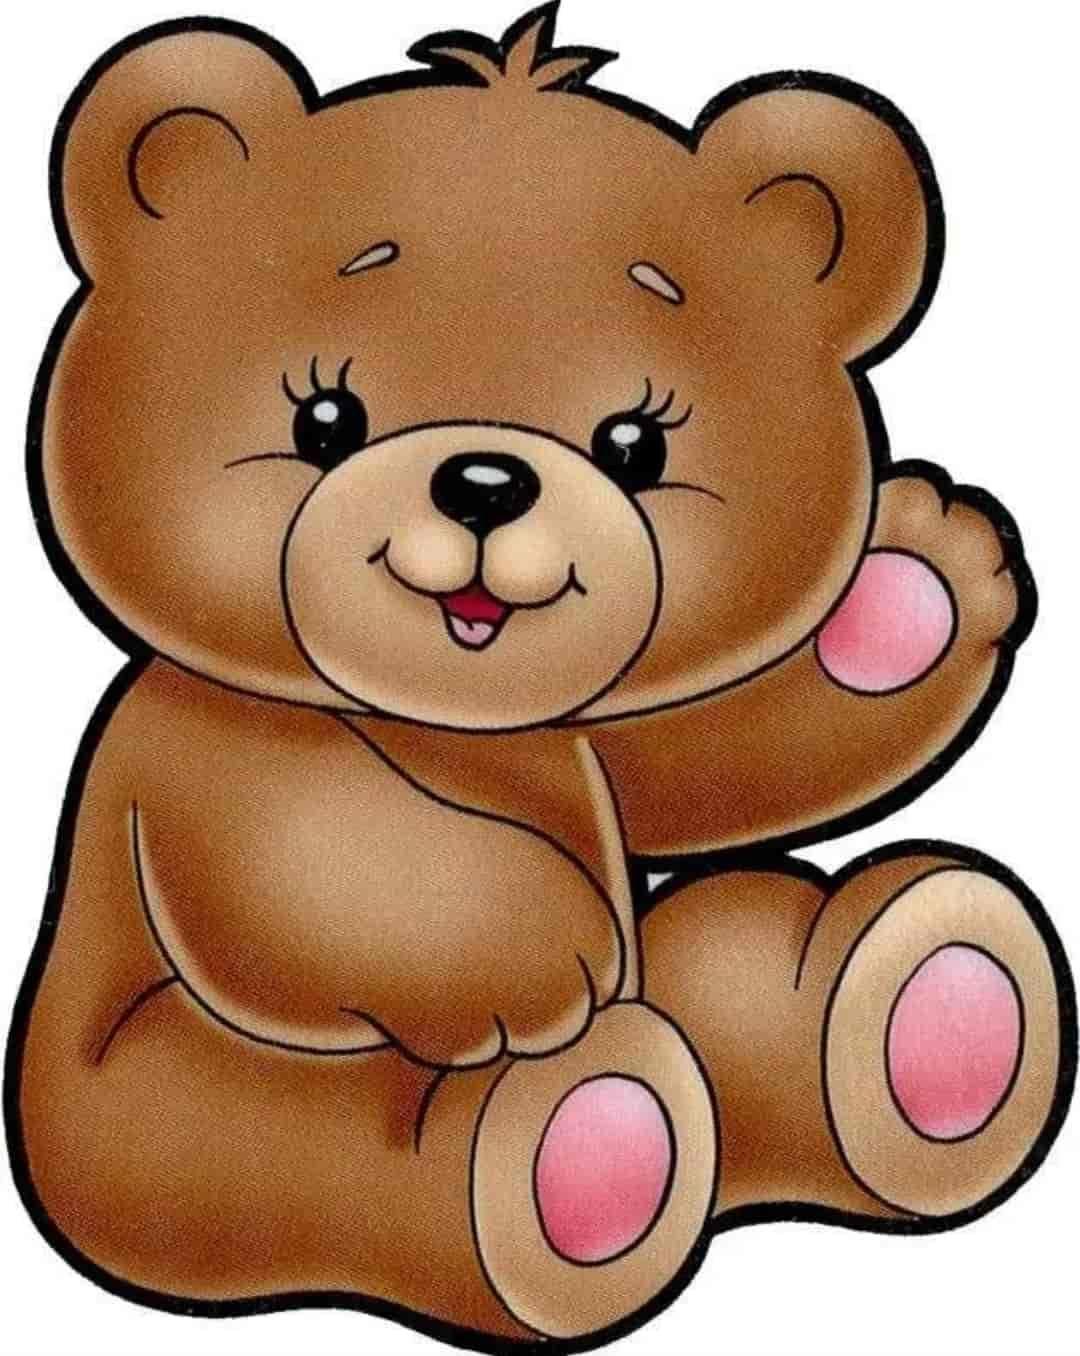 Free Download Teddy Bear Clip Art Teddy Bear Cartoon Teddy Bear Images Baby Clip Art